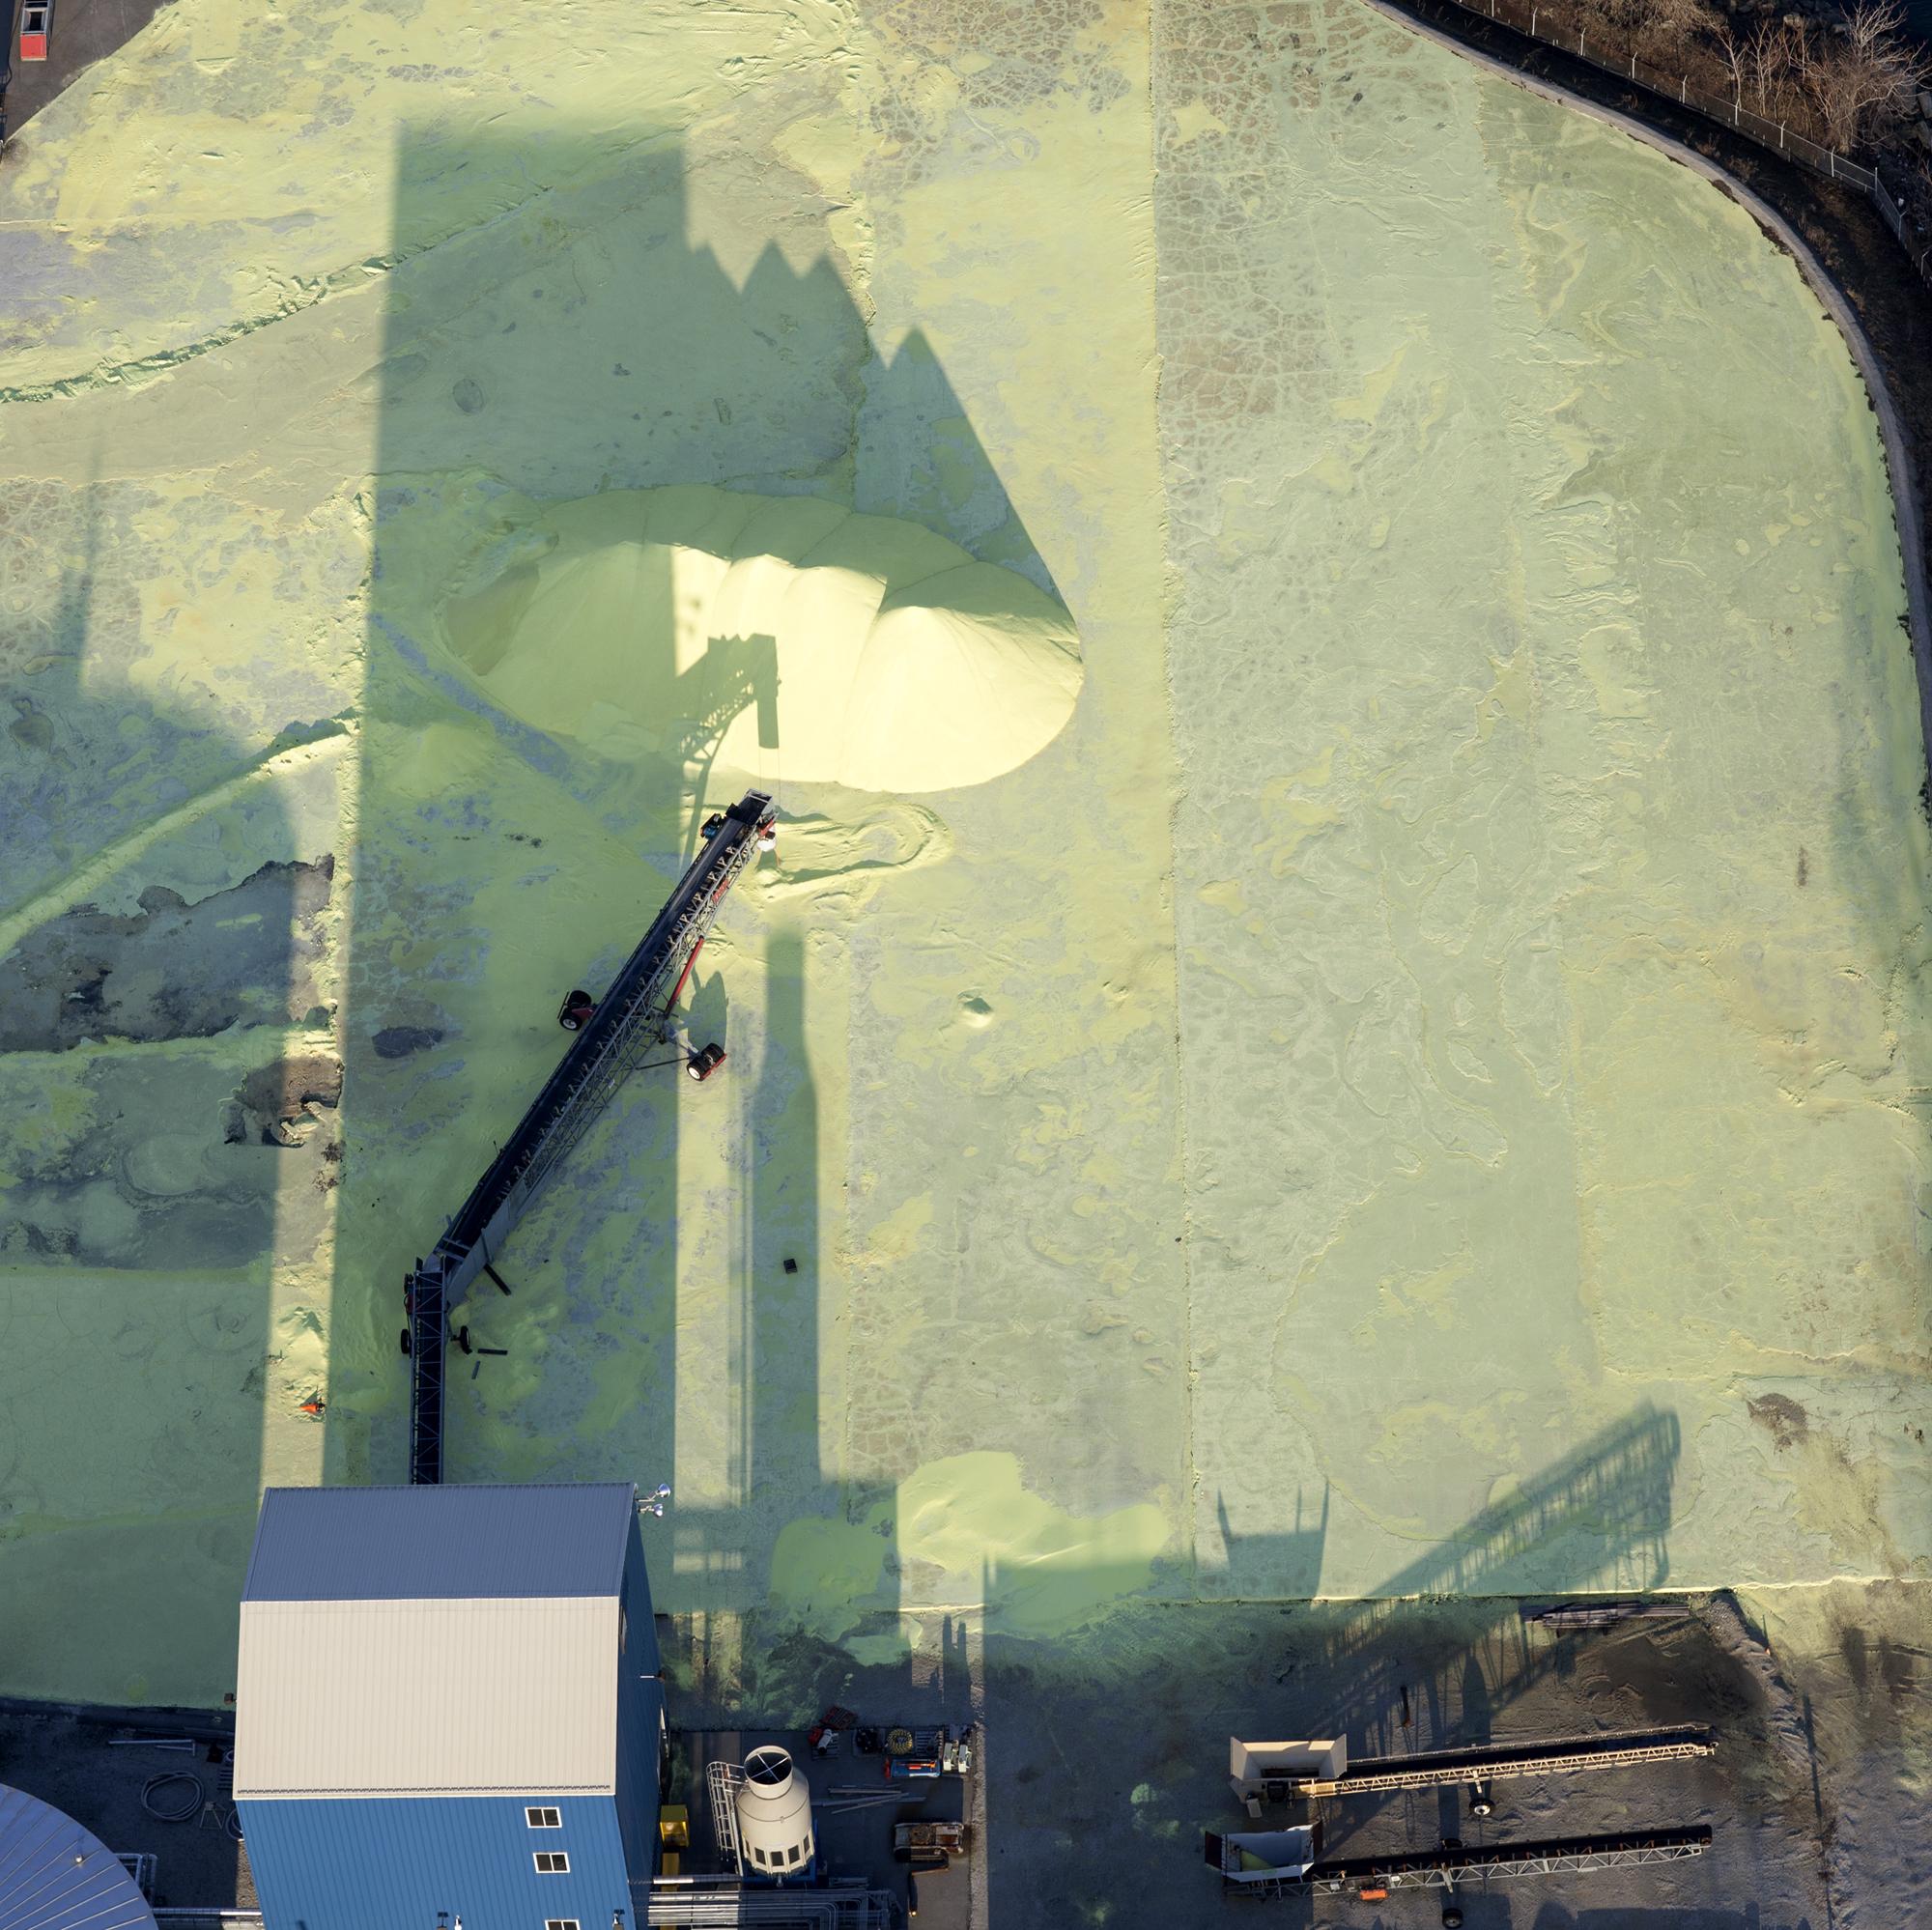 Sulphur storage, Calumet River, Southeast Chicago, 2015. Terry Evans